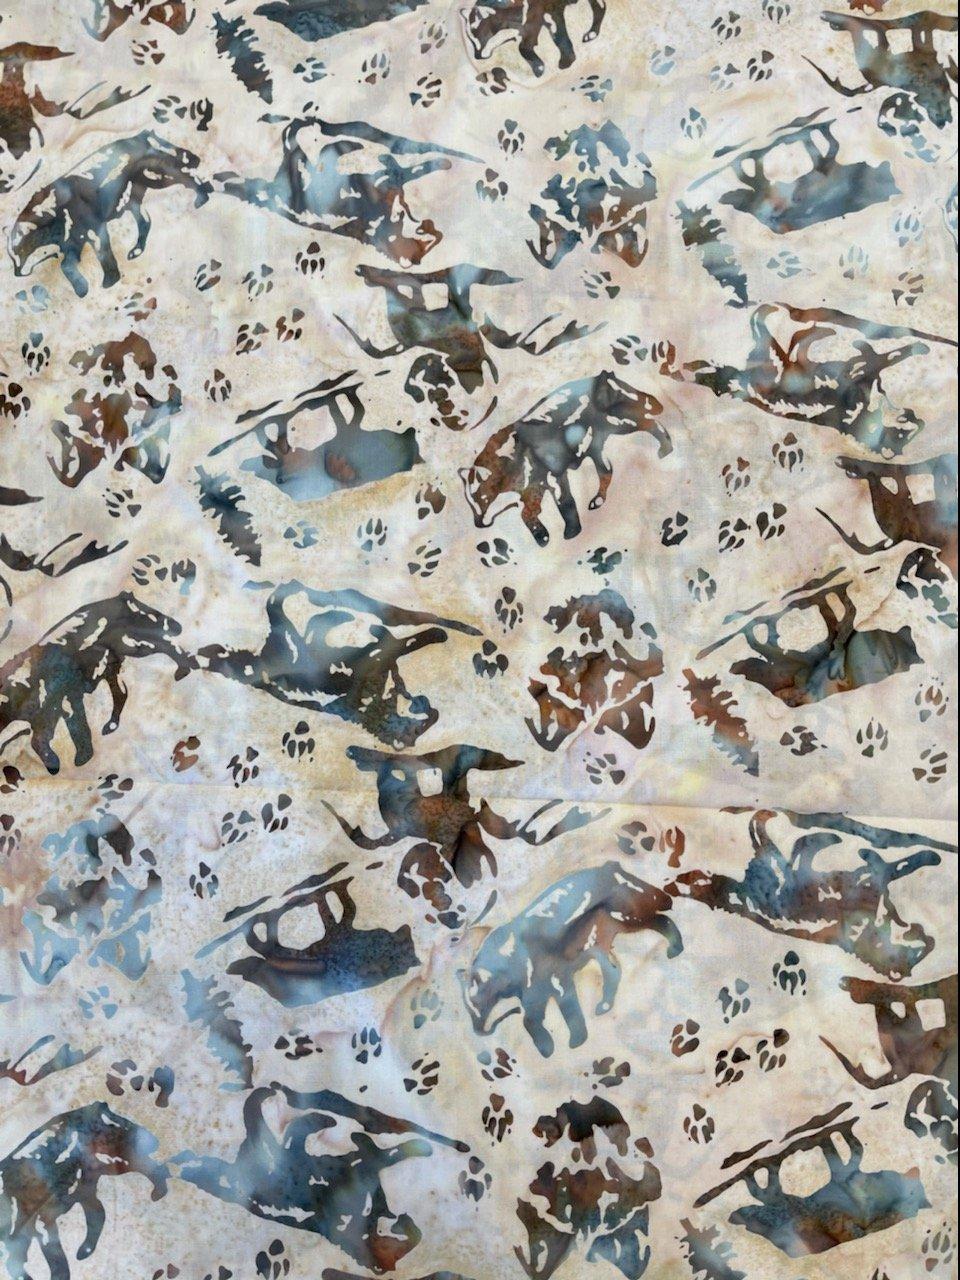 Hoffman S2351-193 Desert Wolf Batik